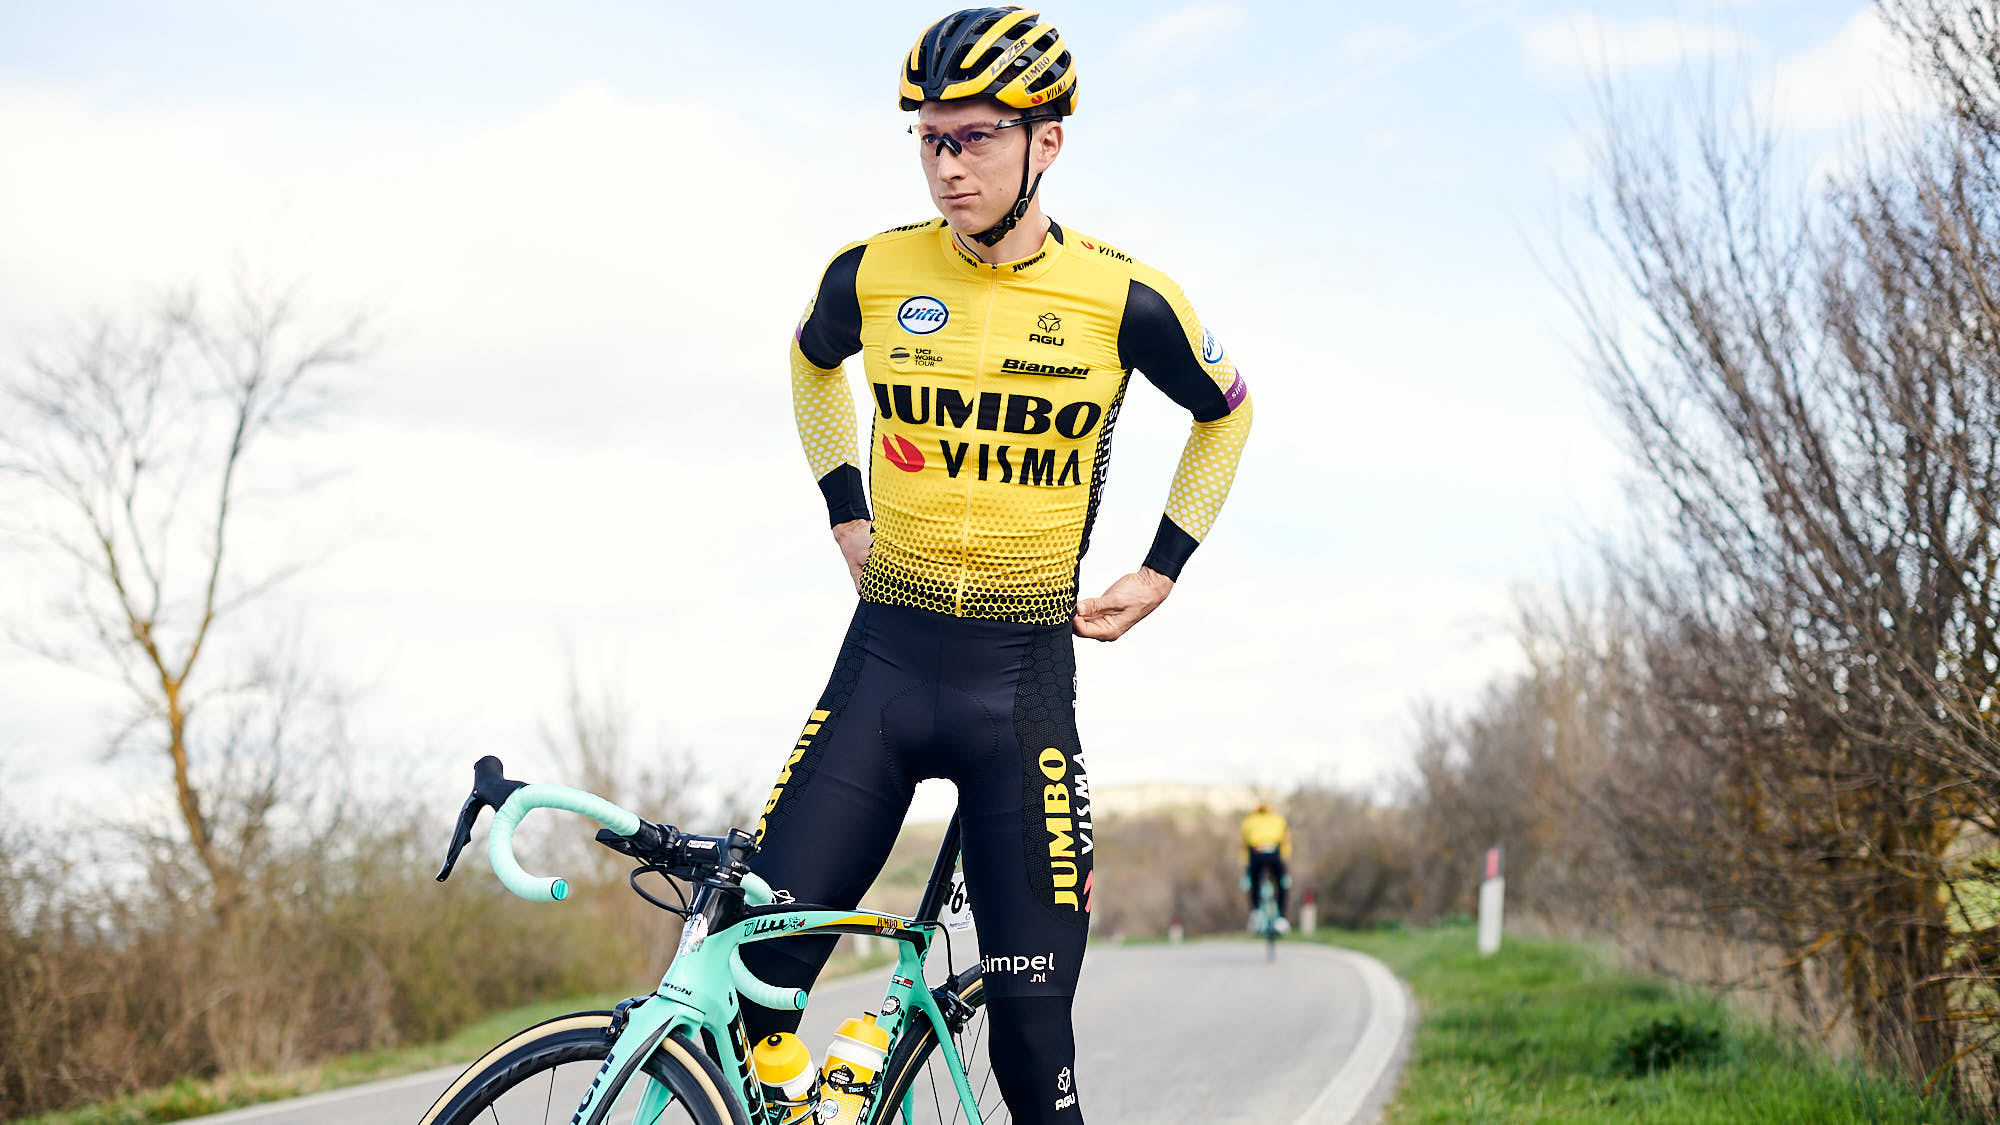 Jumbo-Visma rider Nielson Powless during recon